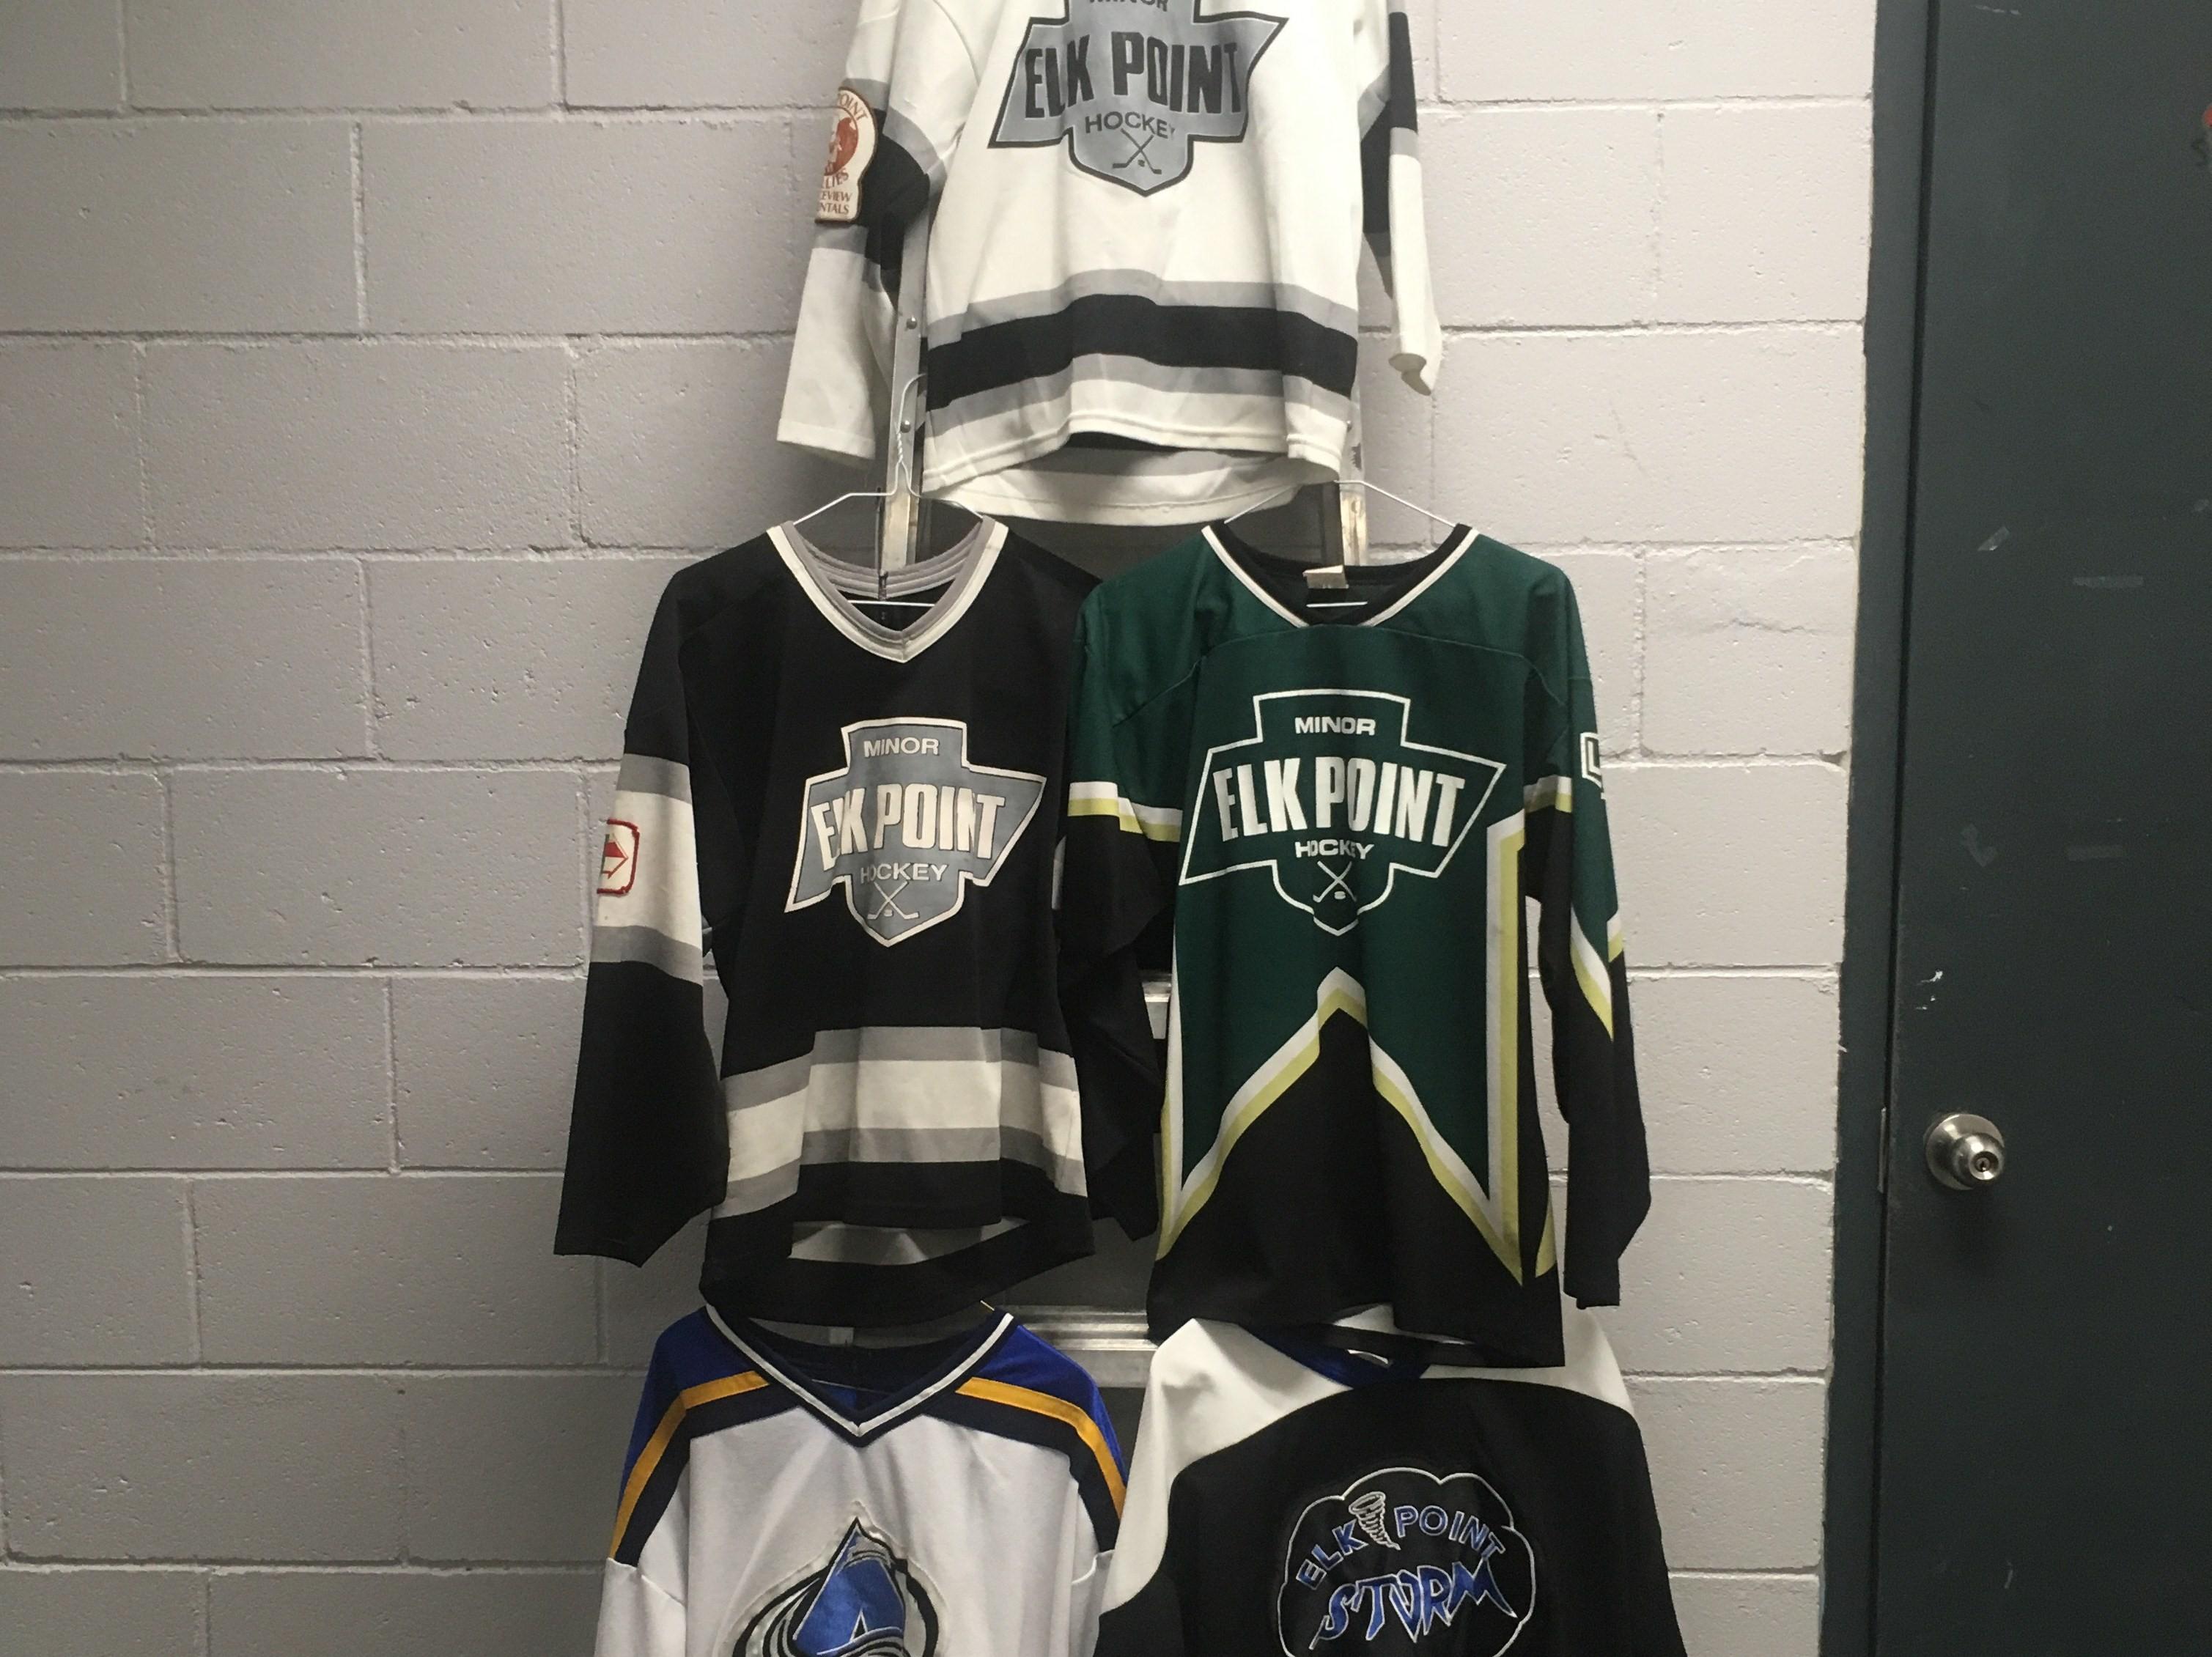 lowest price 5030c 58af1 Elk Point Minor Hockey Association : Website by RAMP InterActive